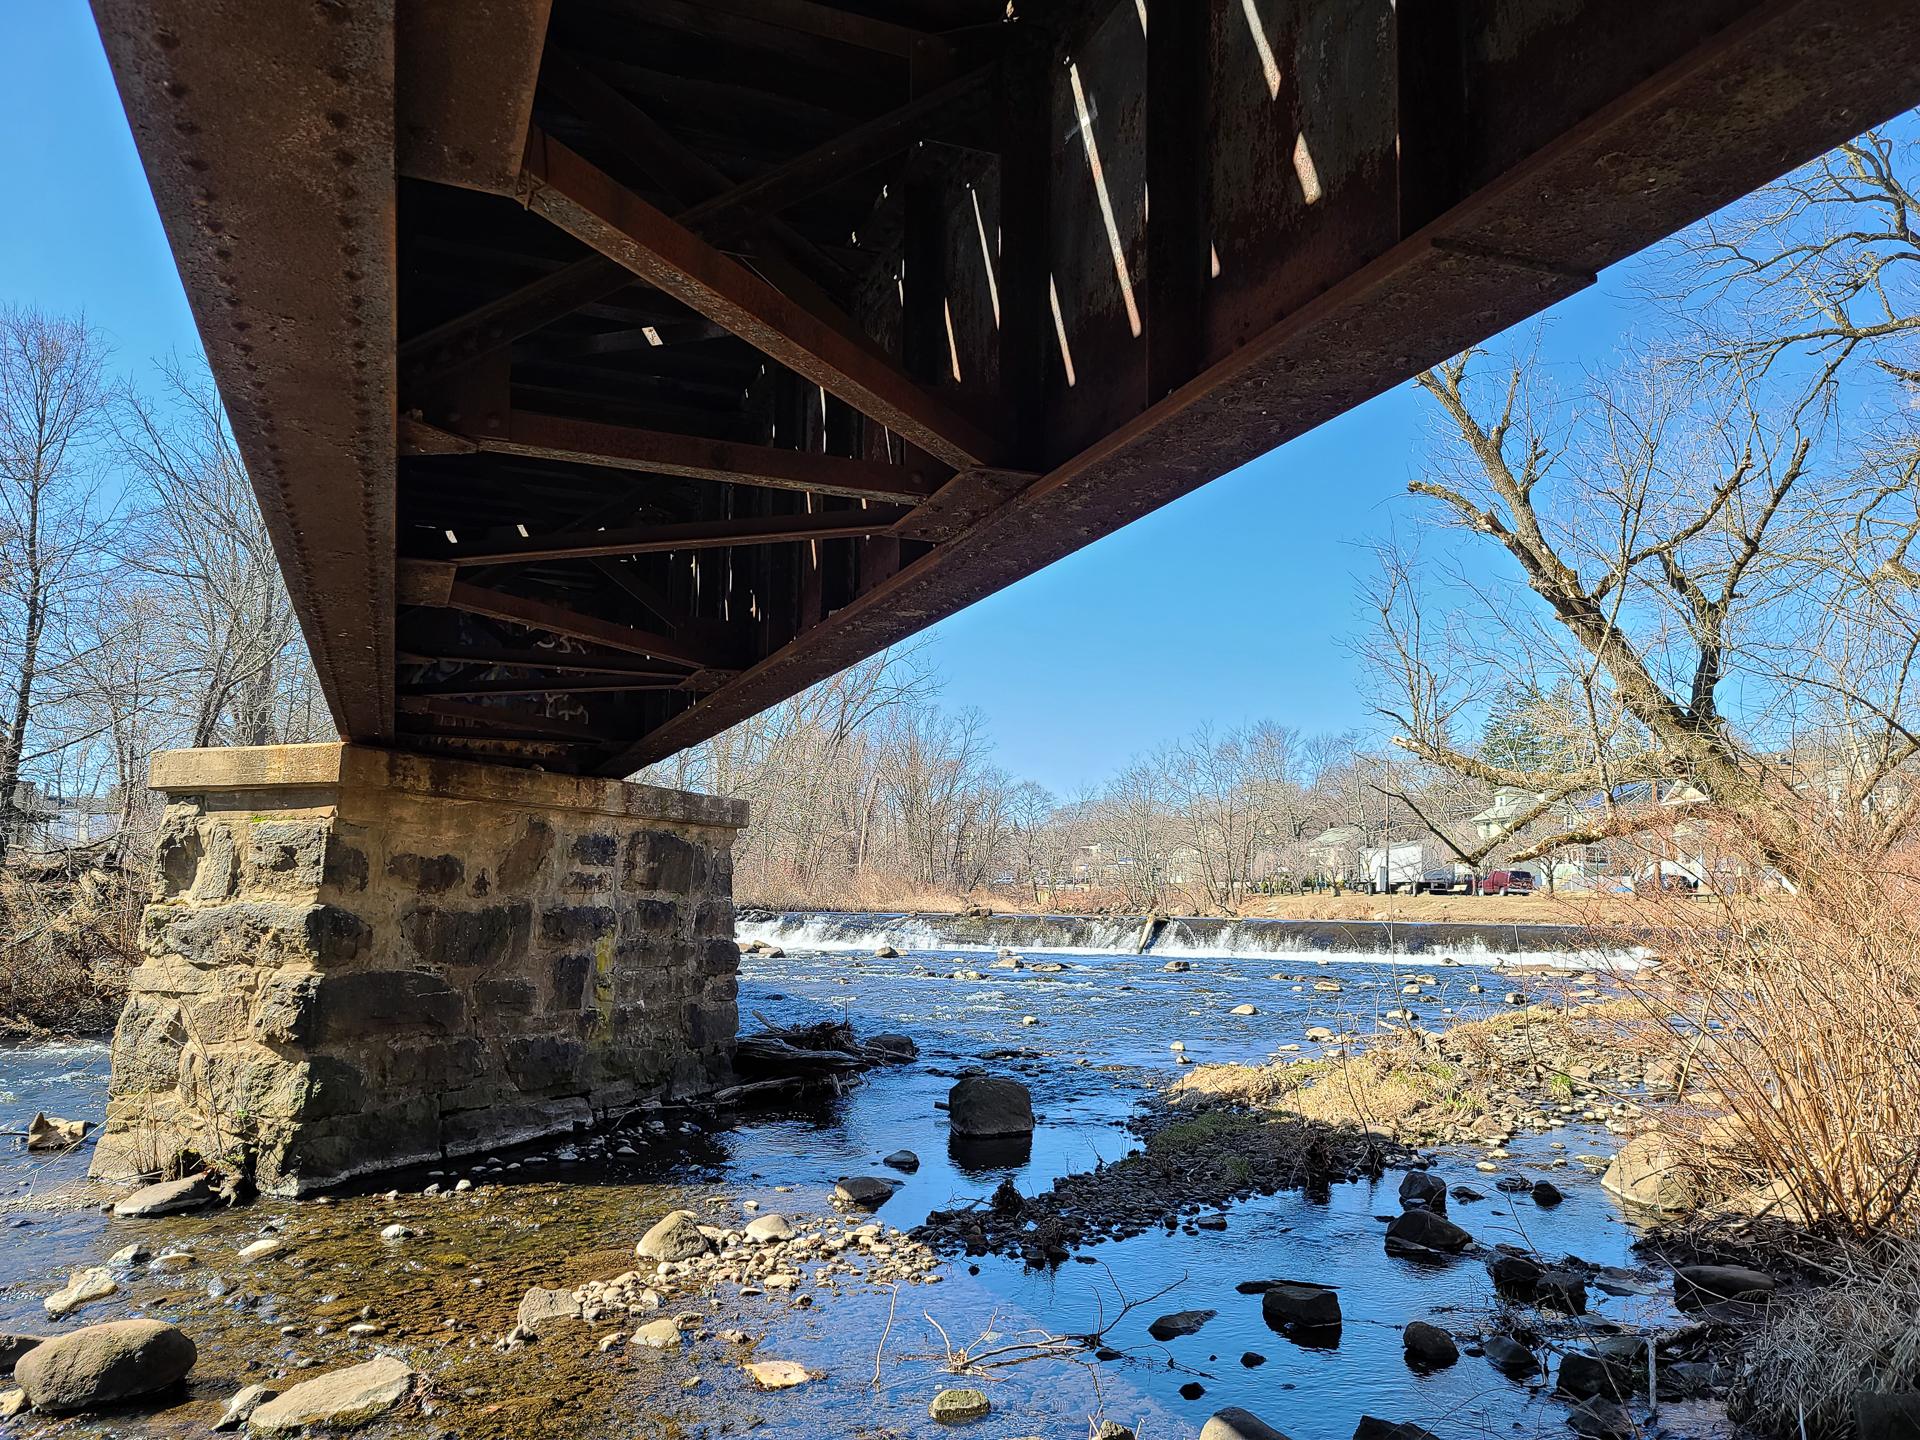 Samsung Galaxy S20 Ultra camera sample under the bridge